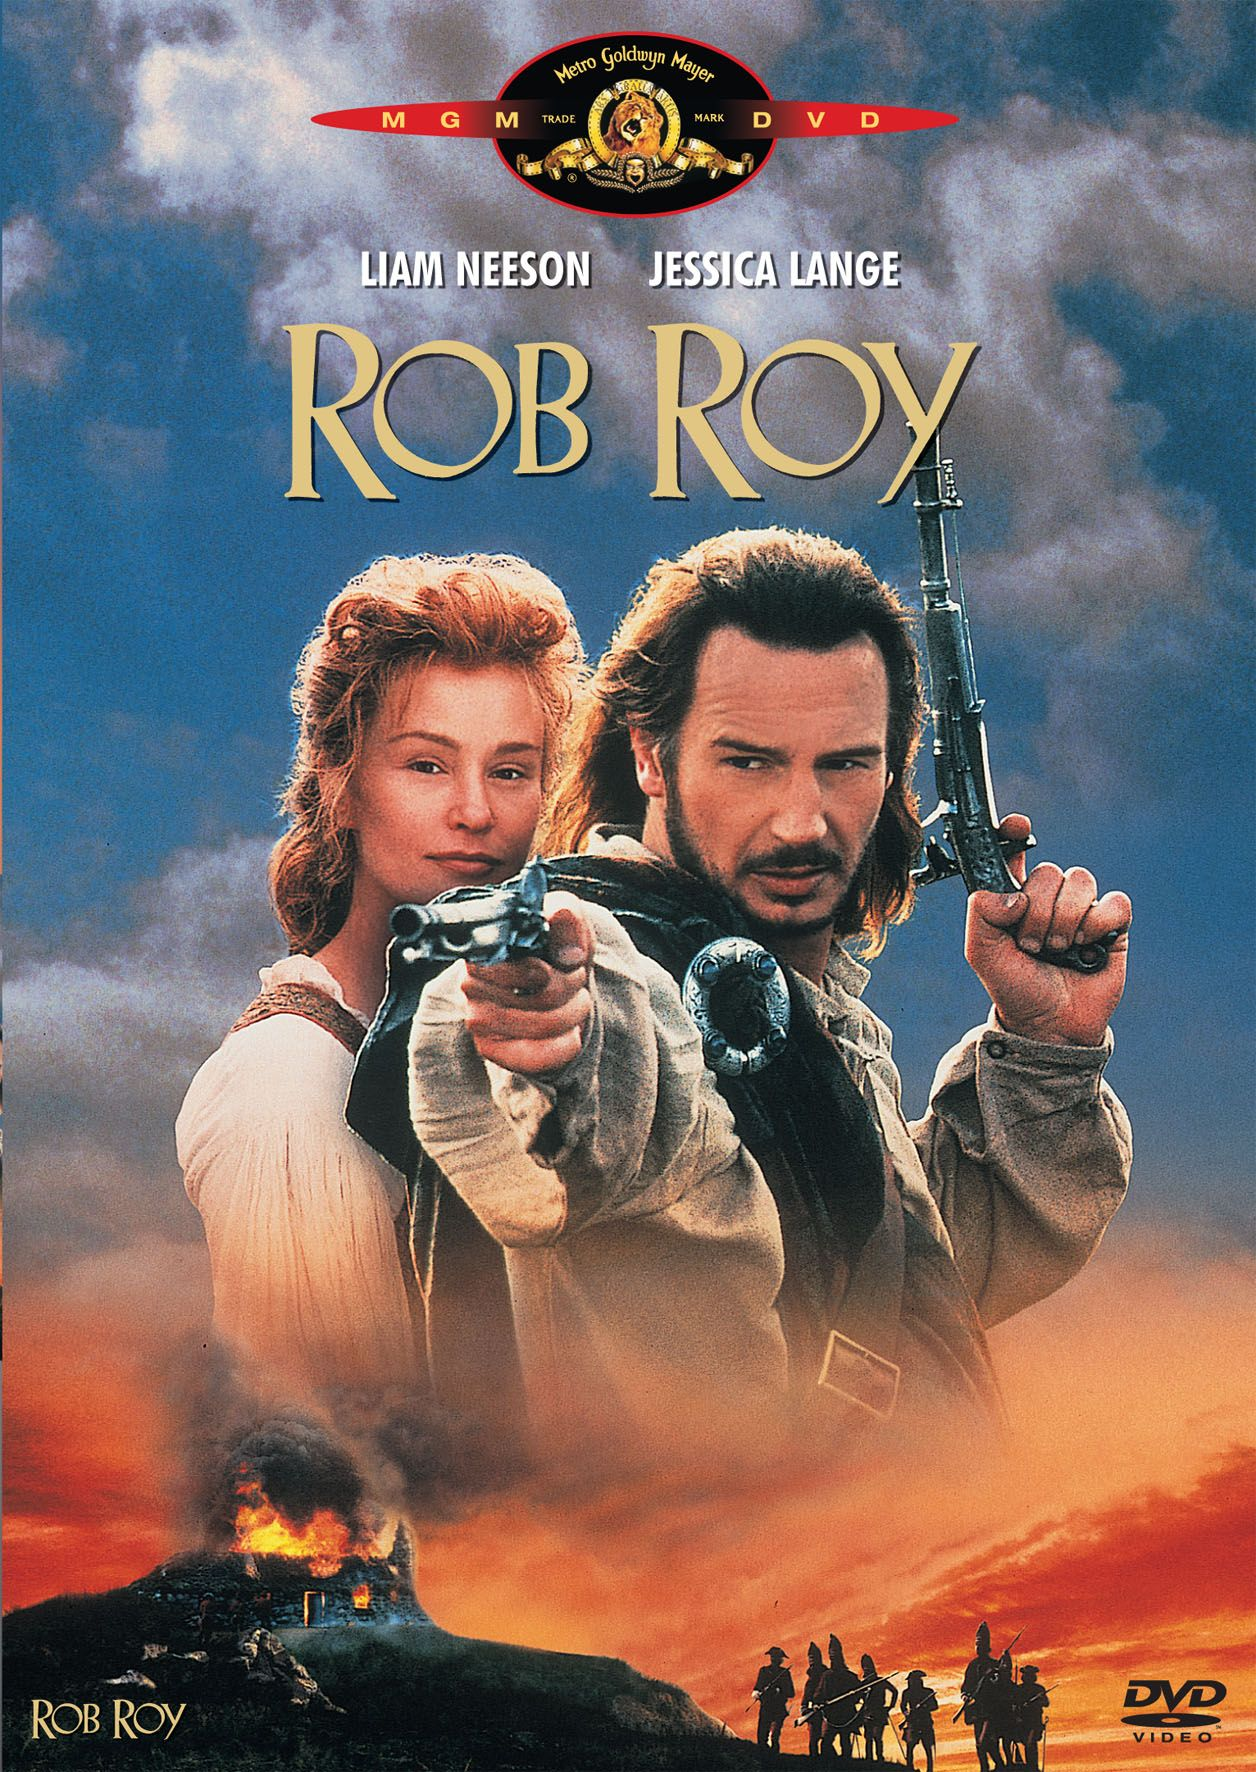 Rob Roy 1995 Rob Roy Jessica Lange Liam Neeson